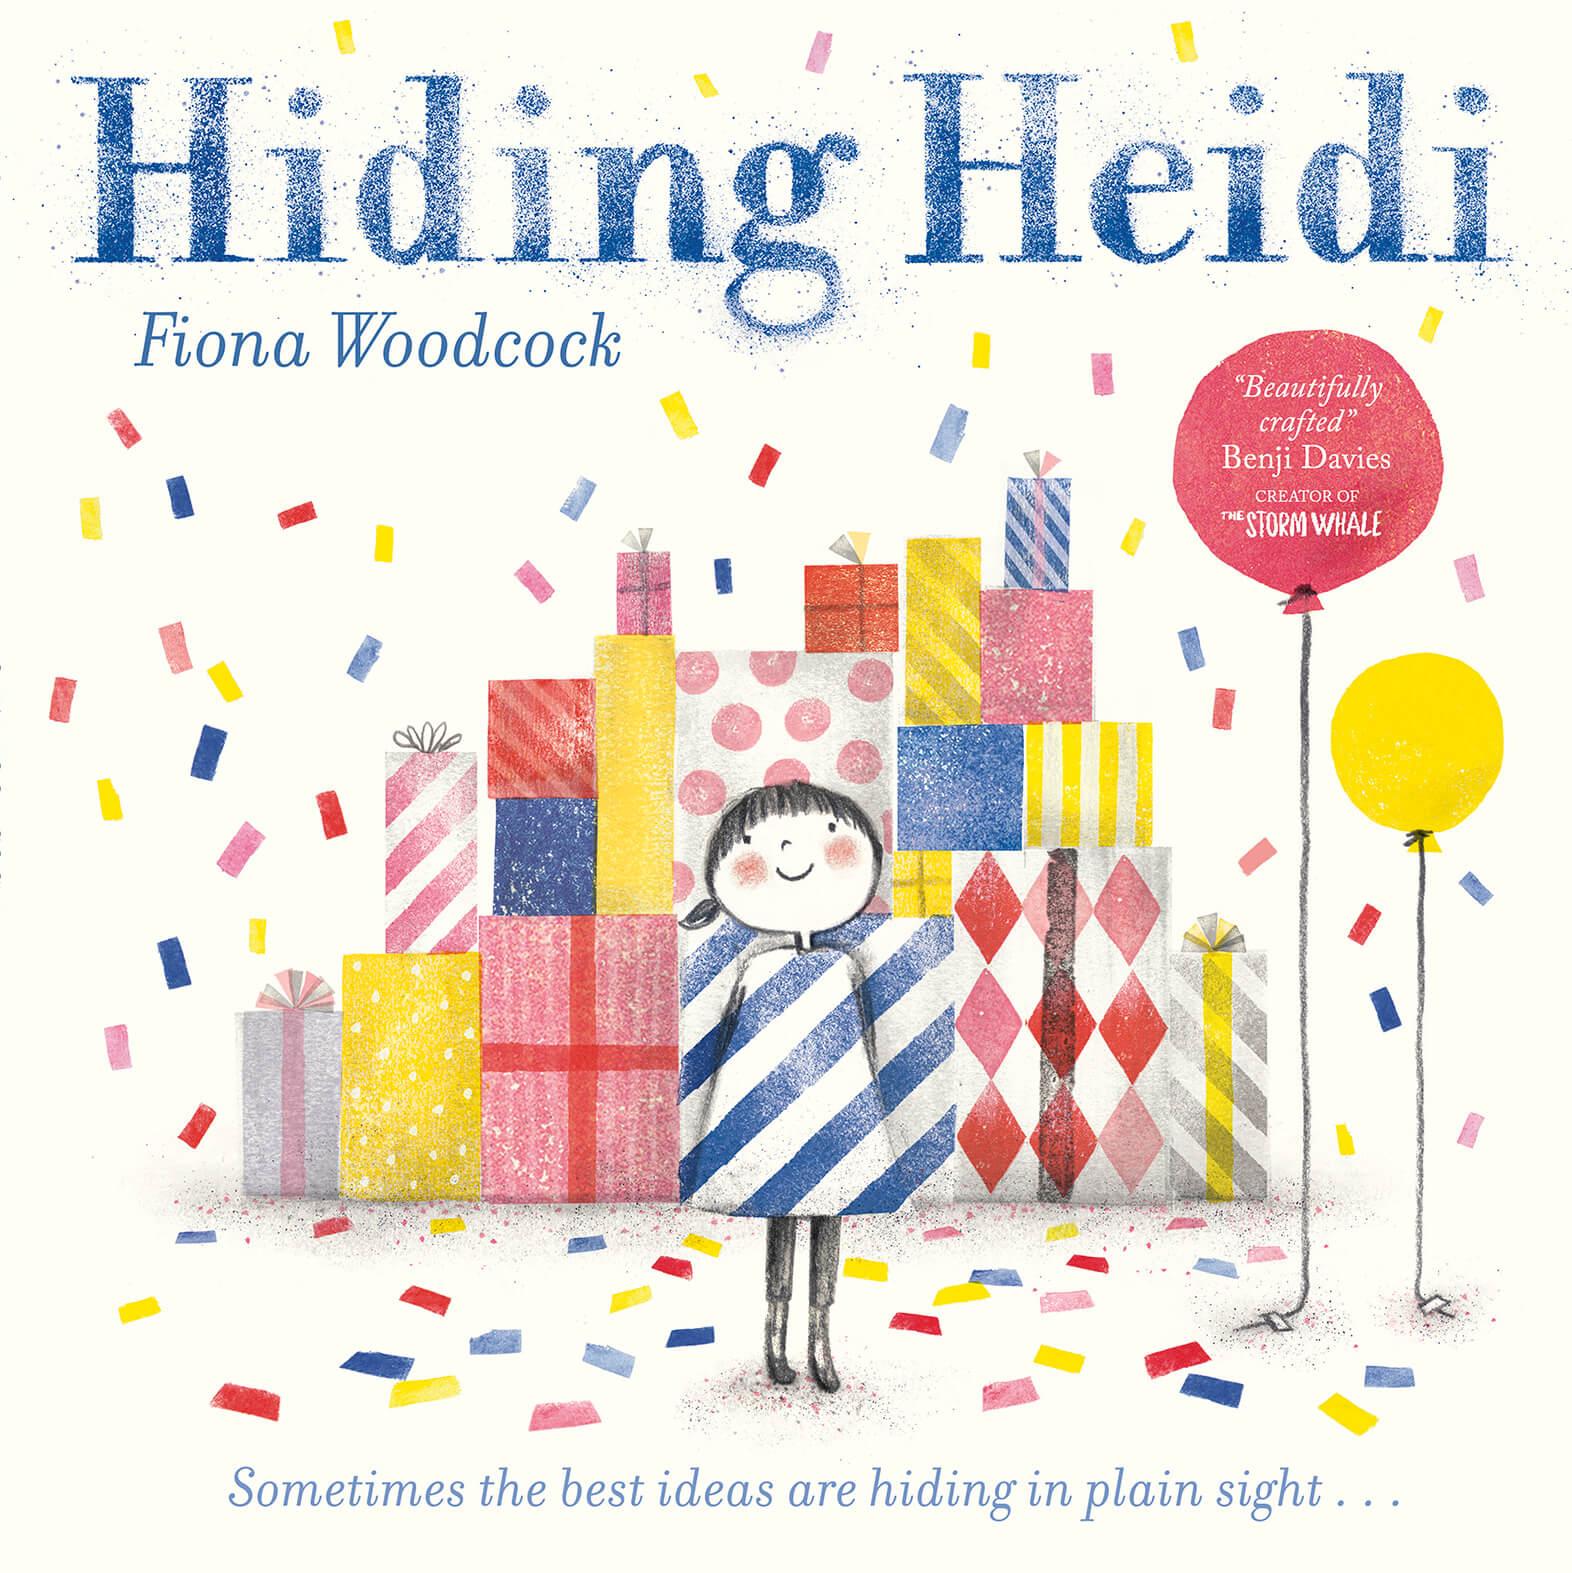 FionaWoodcock_HidingHeidi_Reissue